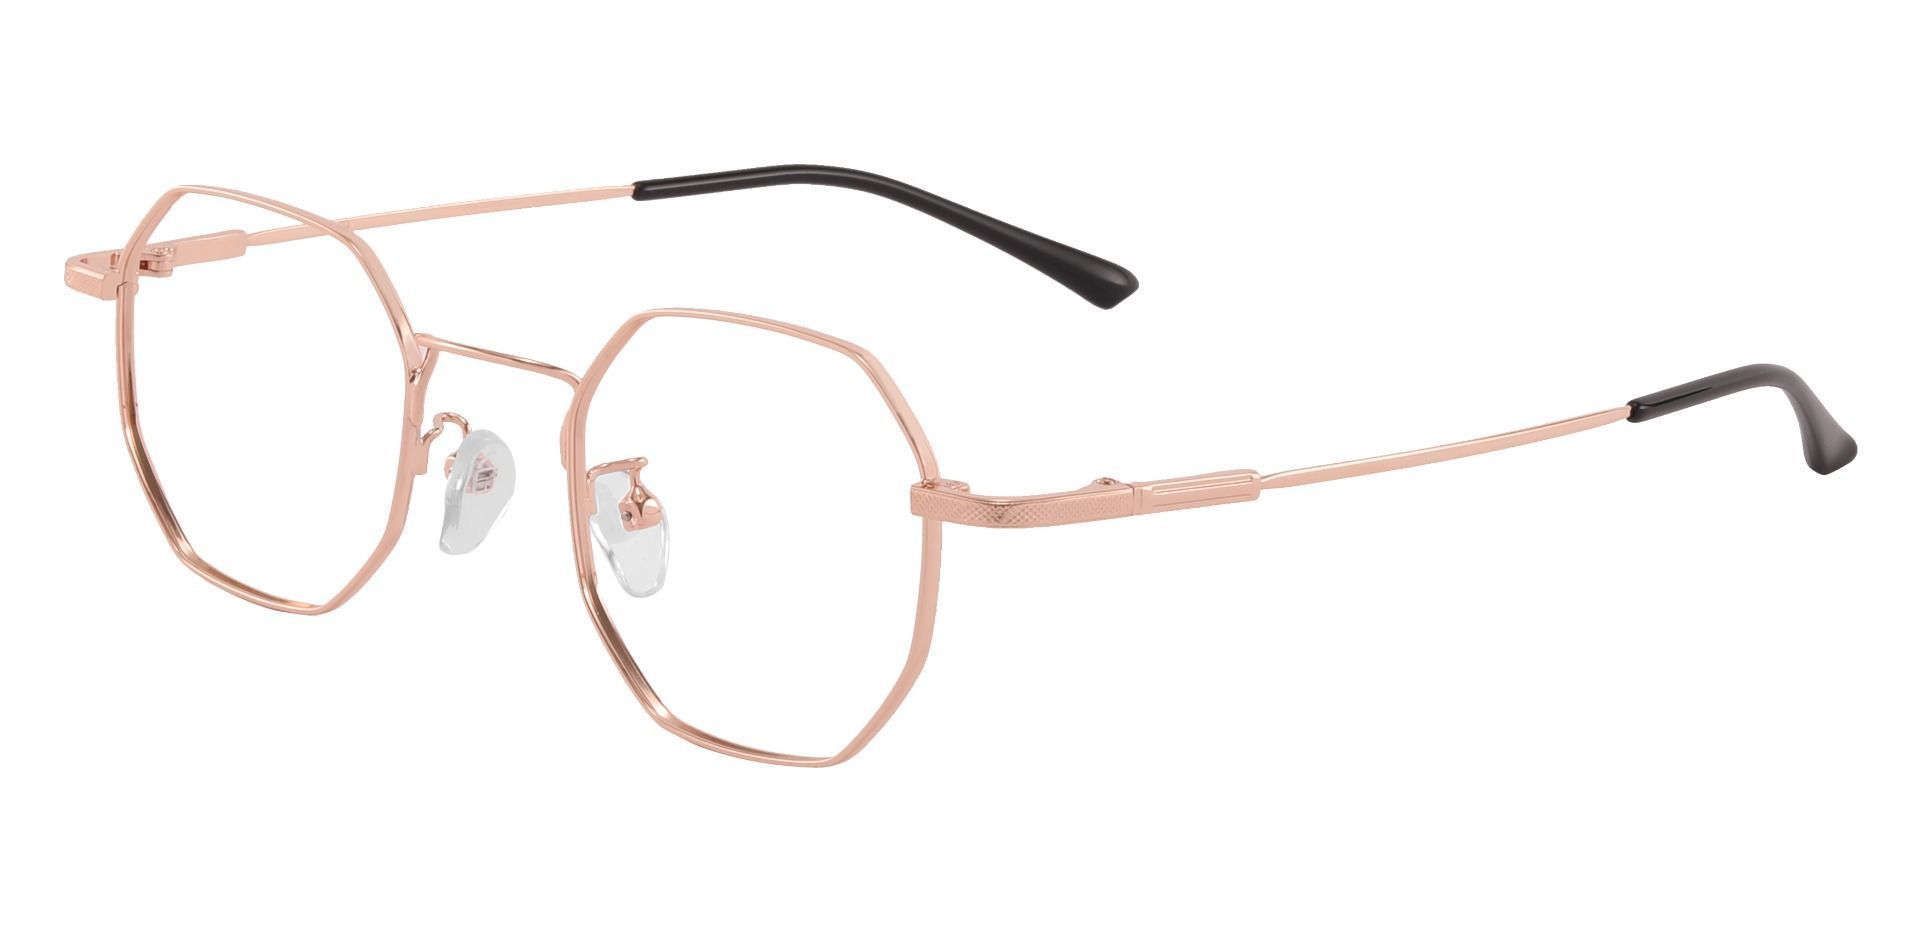 Belgrade Geometric Prescription Glasses - Rose Gold